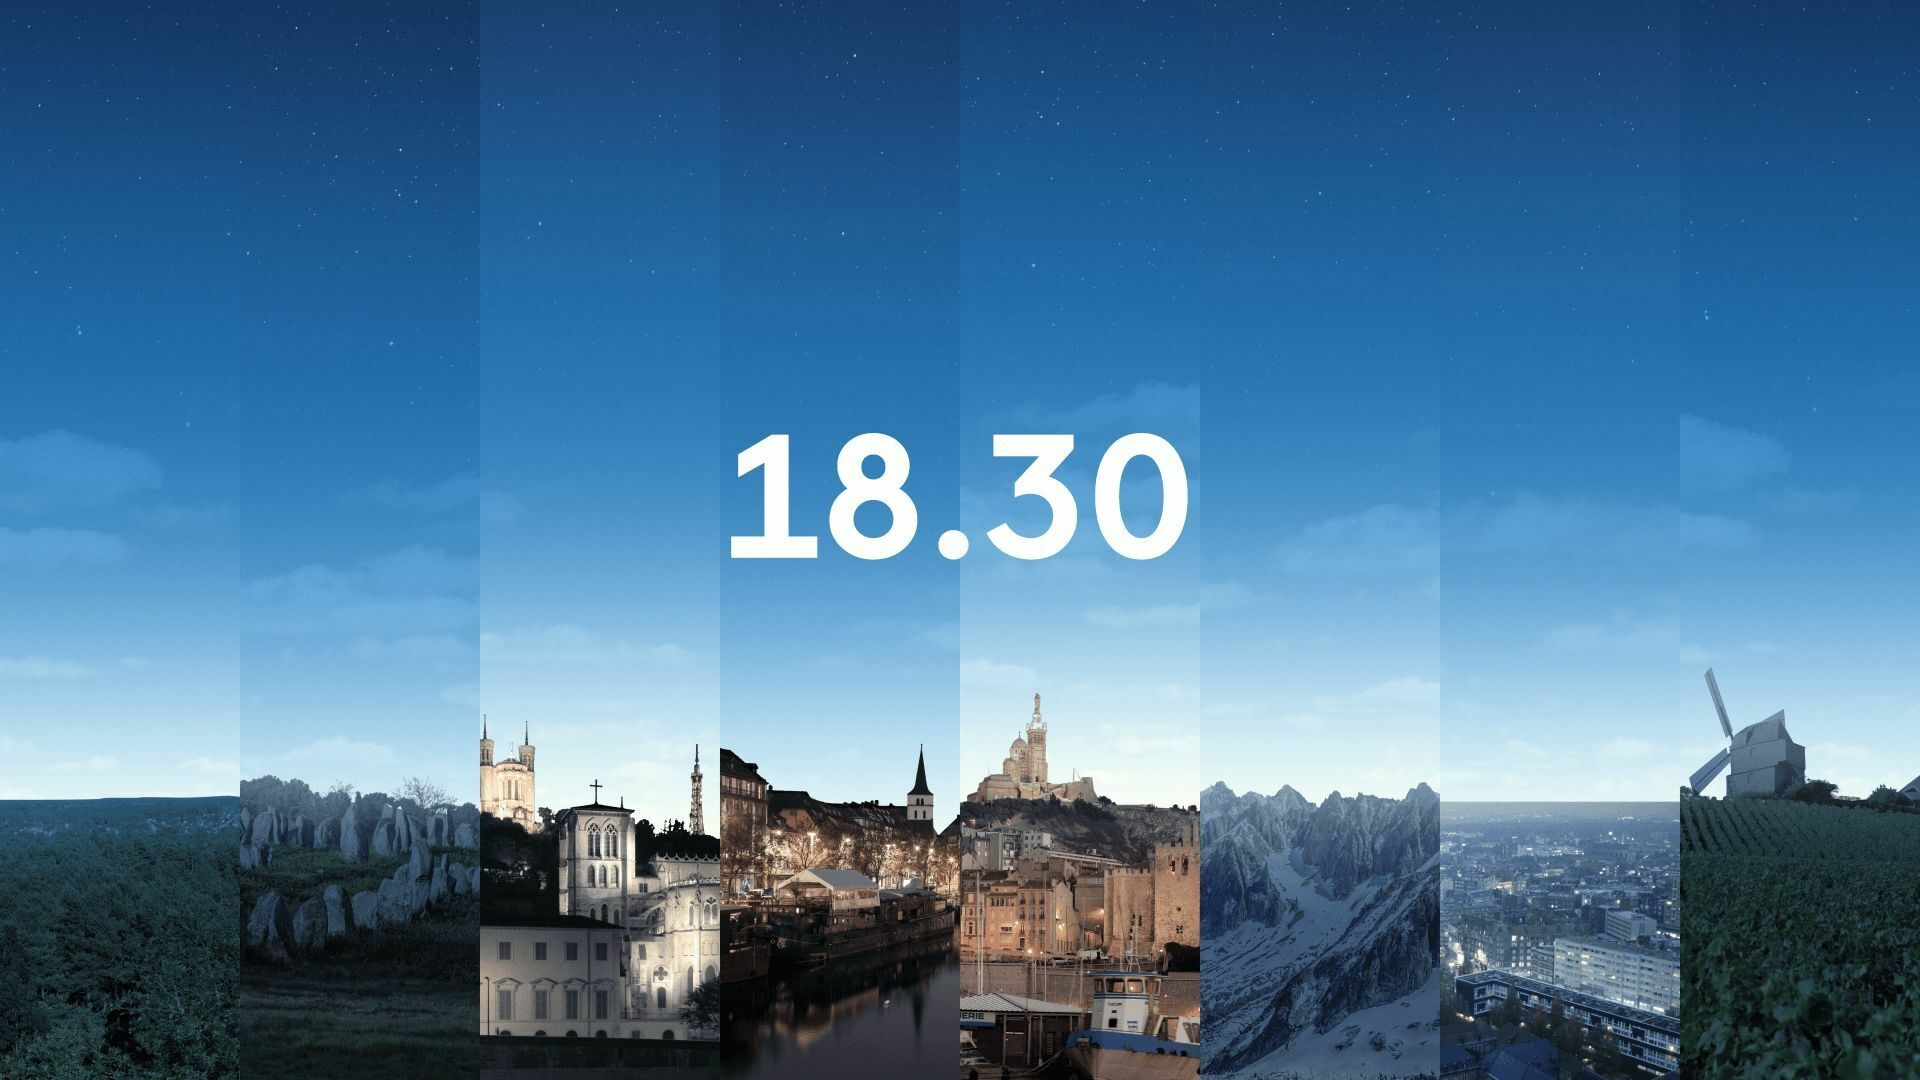 18h30 - On décode Voltaire